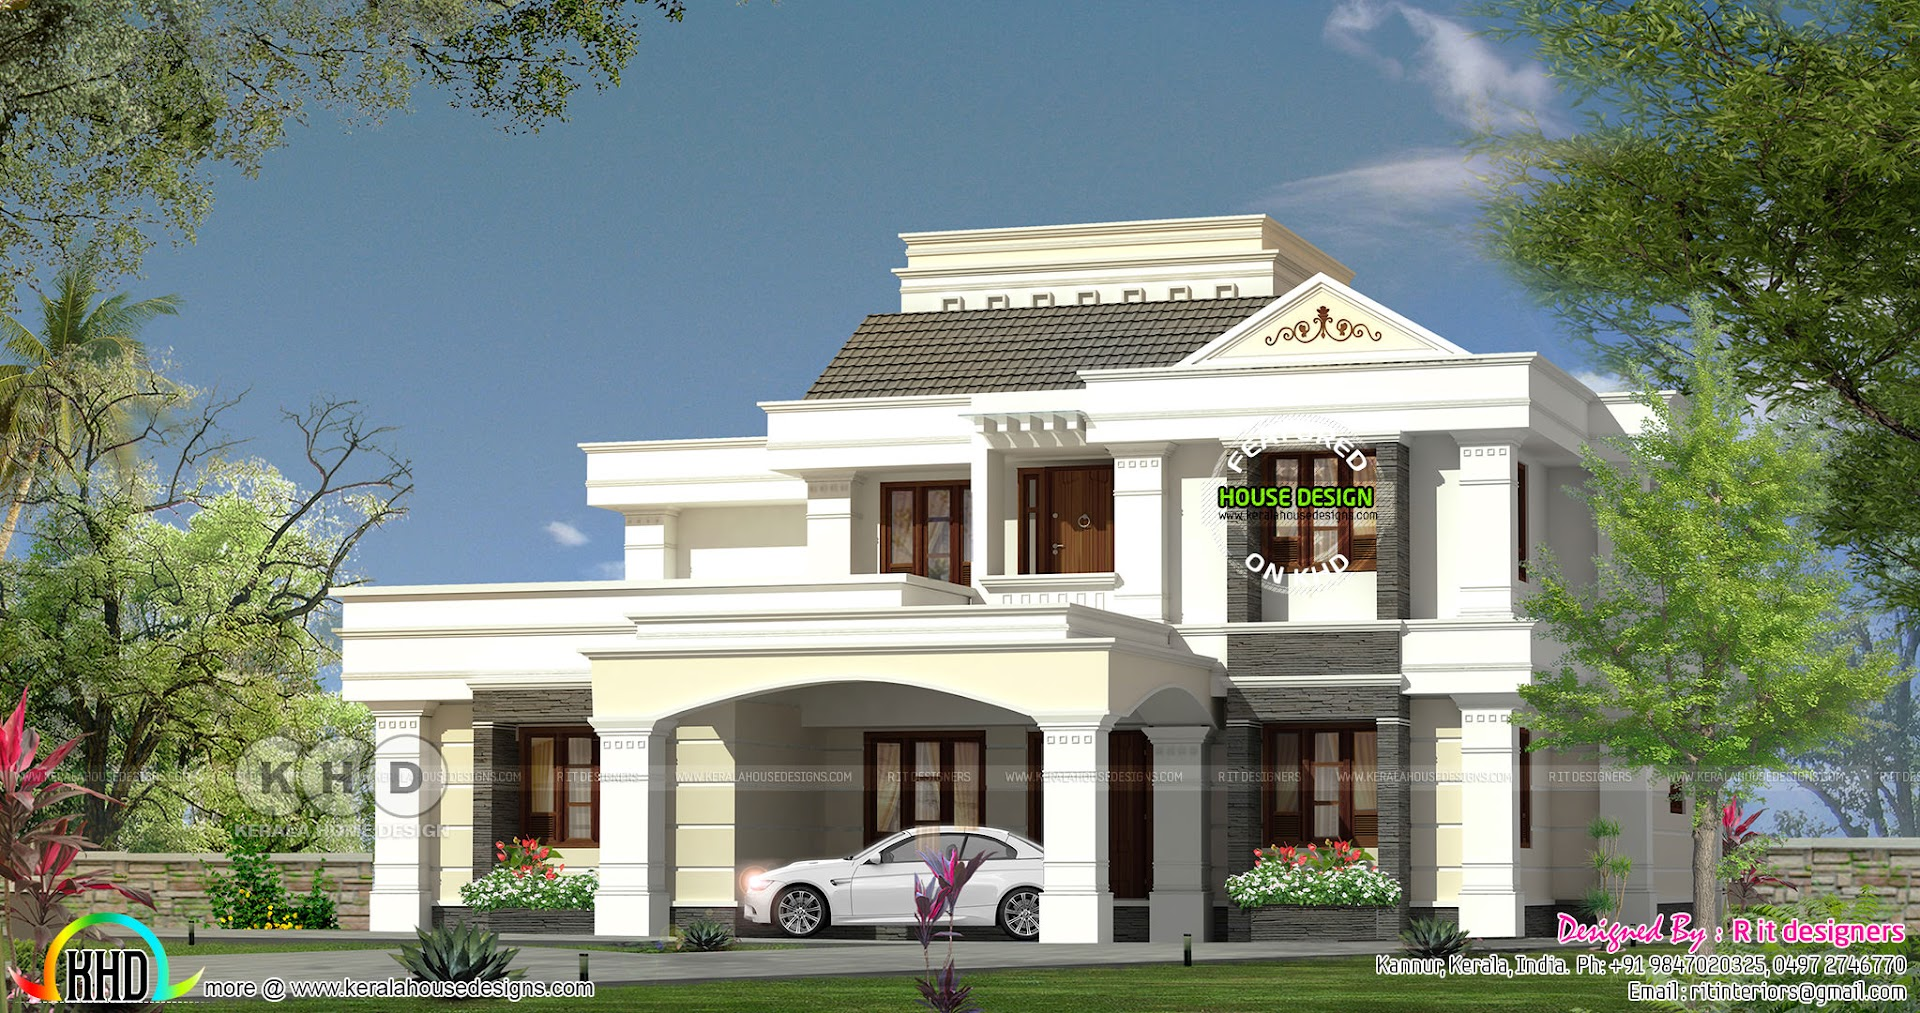 colonial home designs. Please Follow Kerala Home Design 290 Square Meter Semi Colonial Home  Design Bloglovin